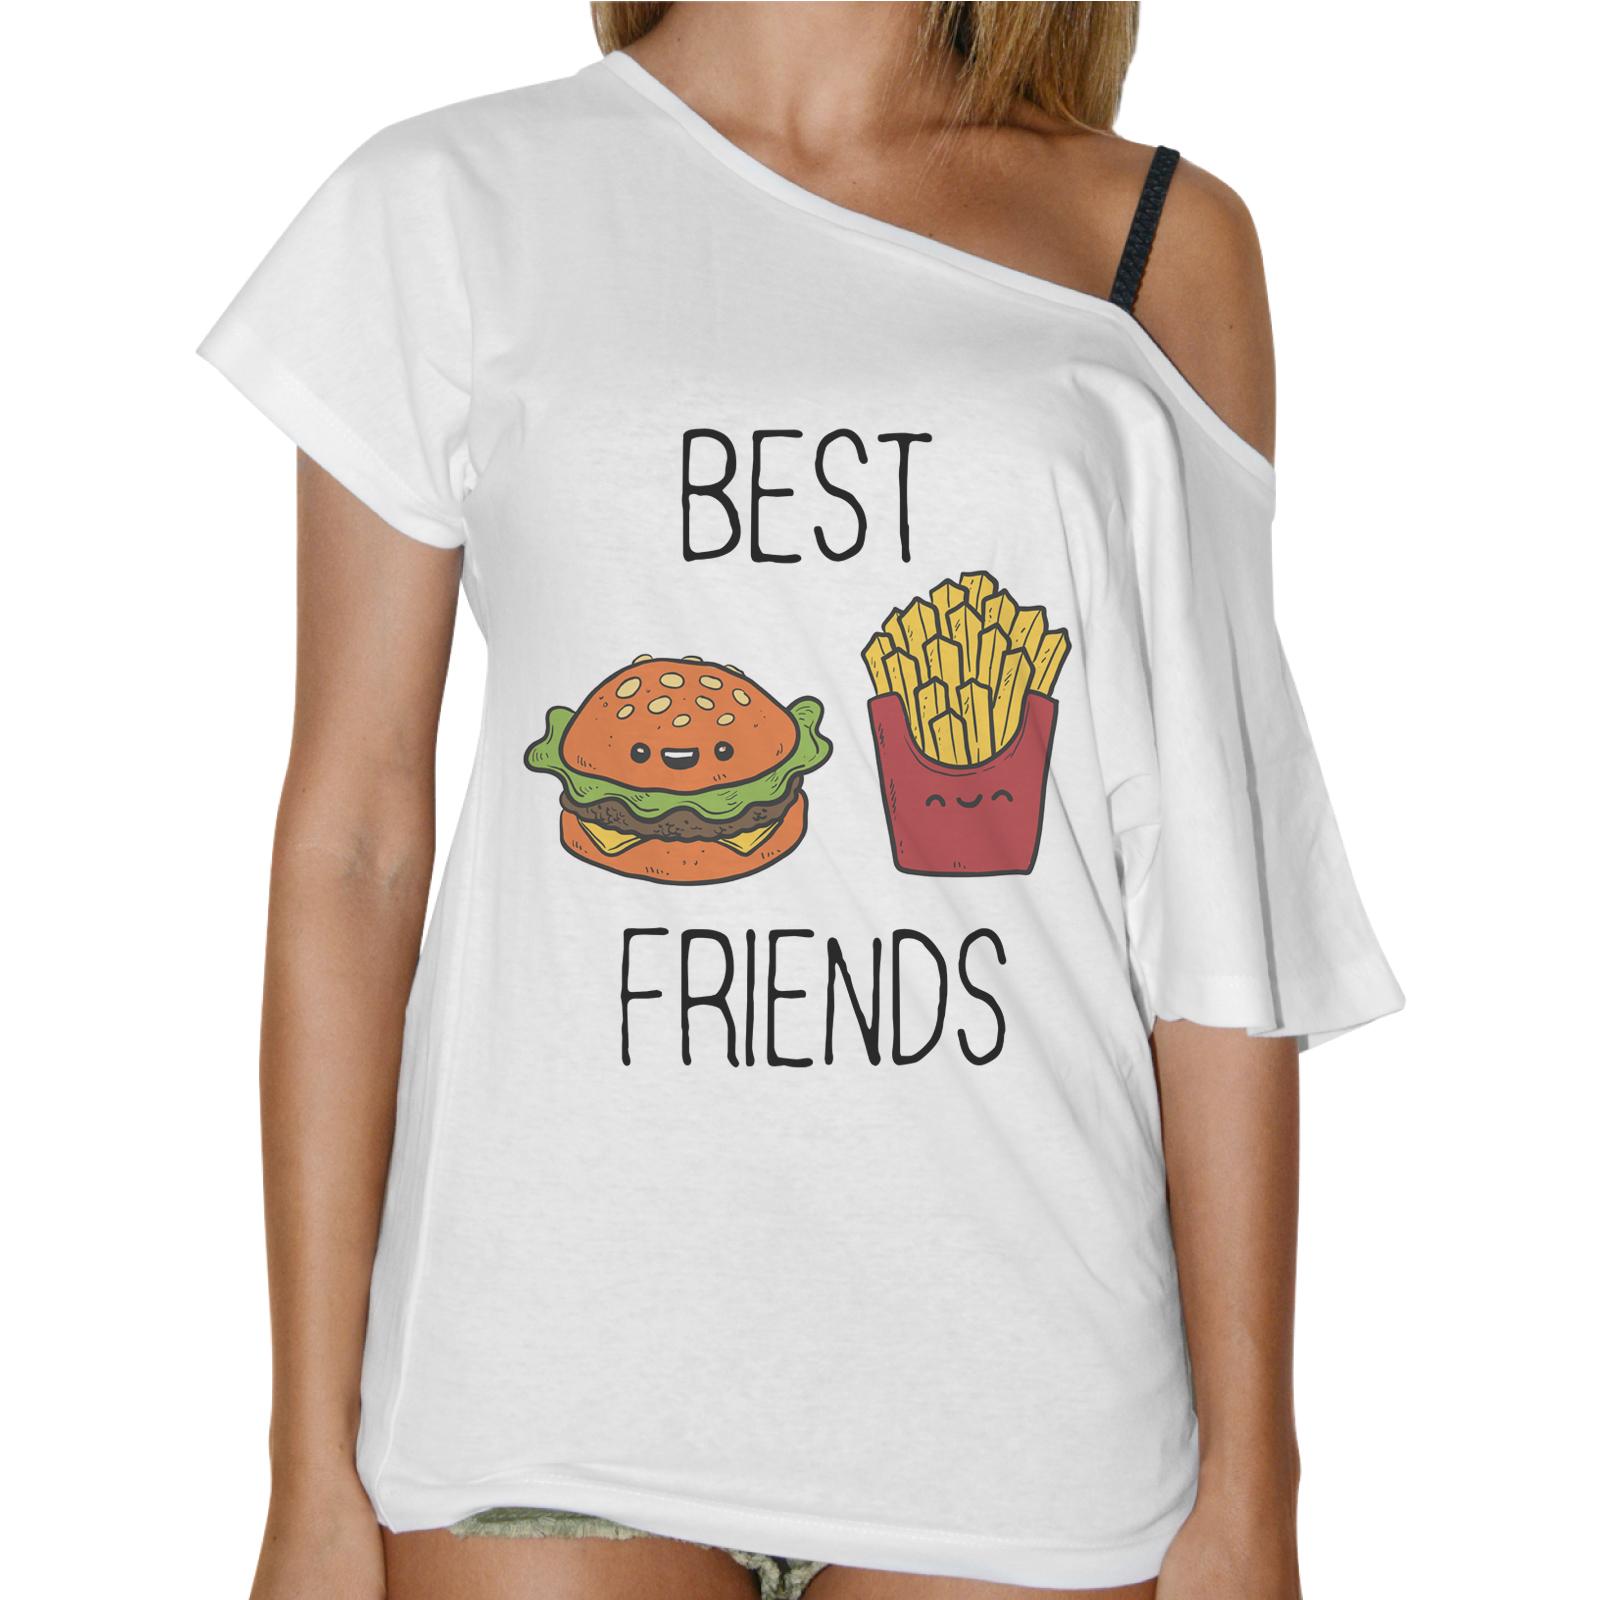 T-Shirt Donna Collo Barca BEST FRIEND MENU